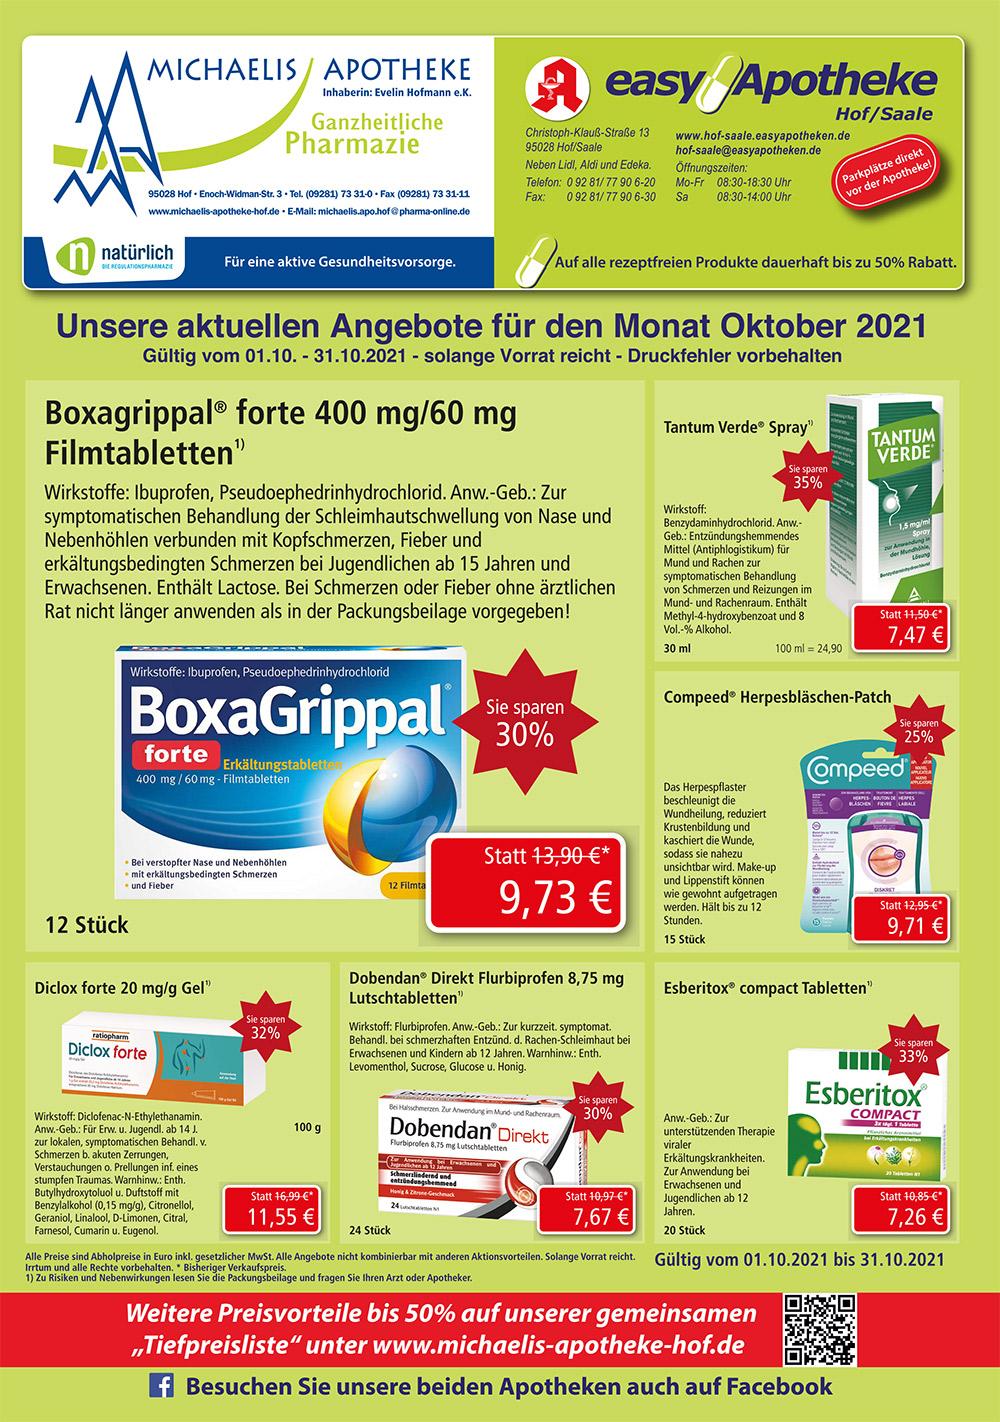 http://www.apotheken.de/fileadmin/clubarea/00000-Angebote/95028_michaelis_angebot_1.jpg